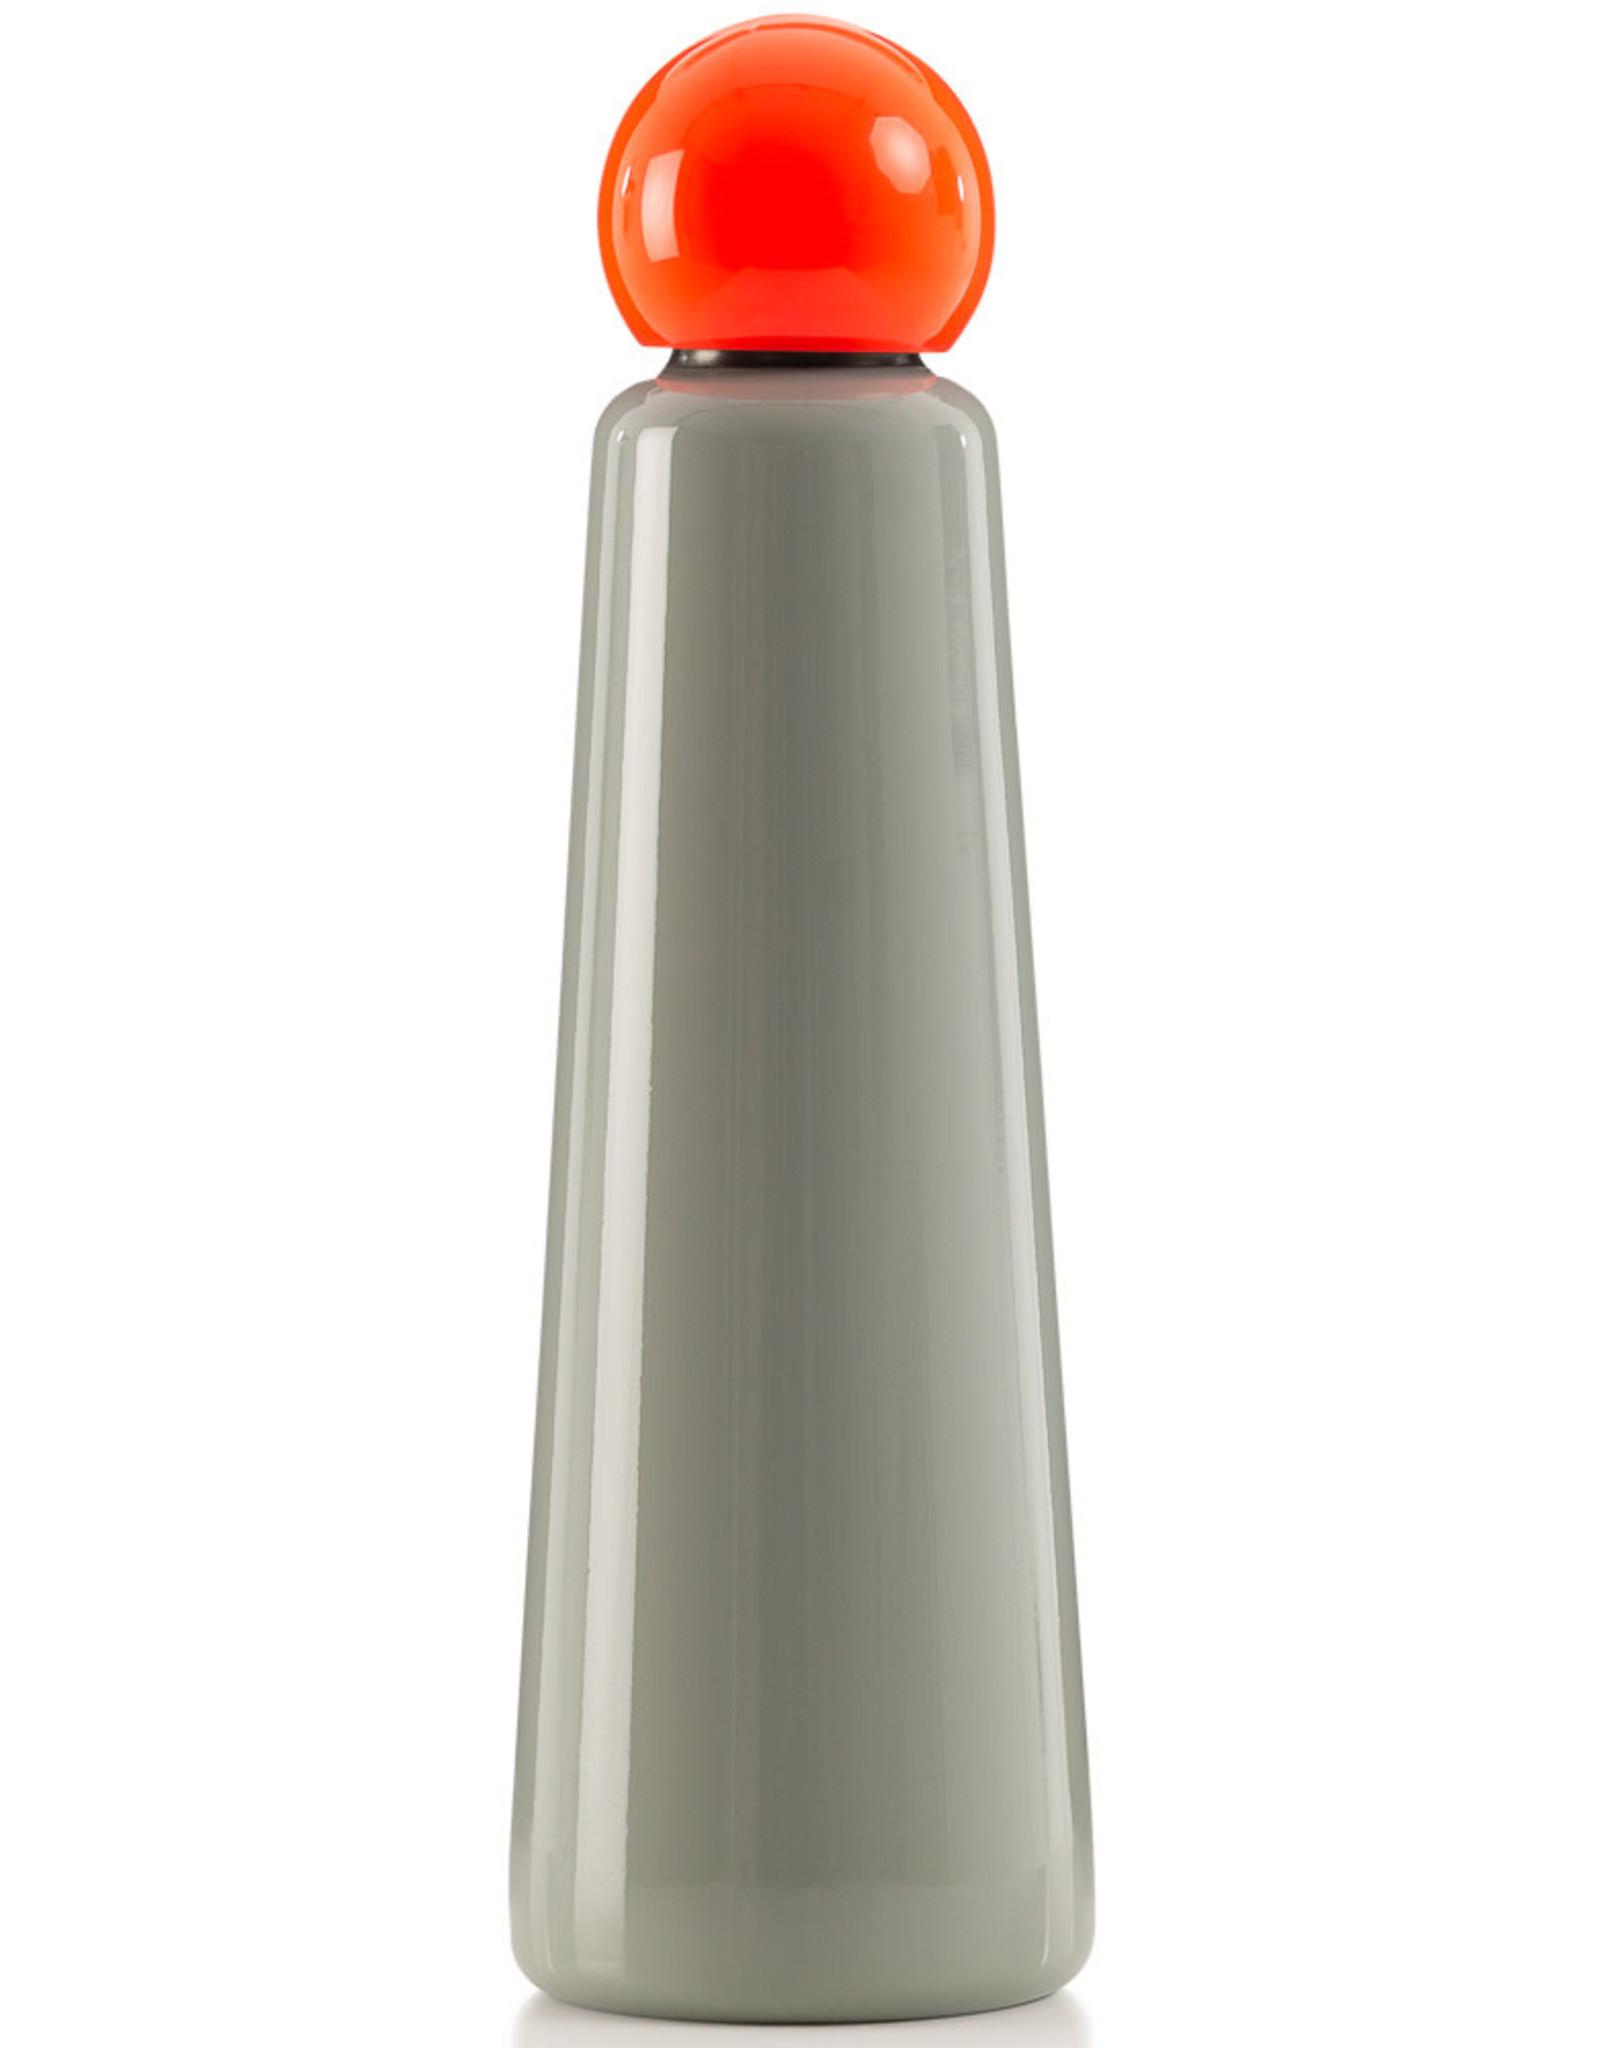 Lund London Skittle Bottle Jumbo 750 ml (Grey & Coral)